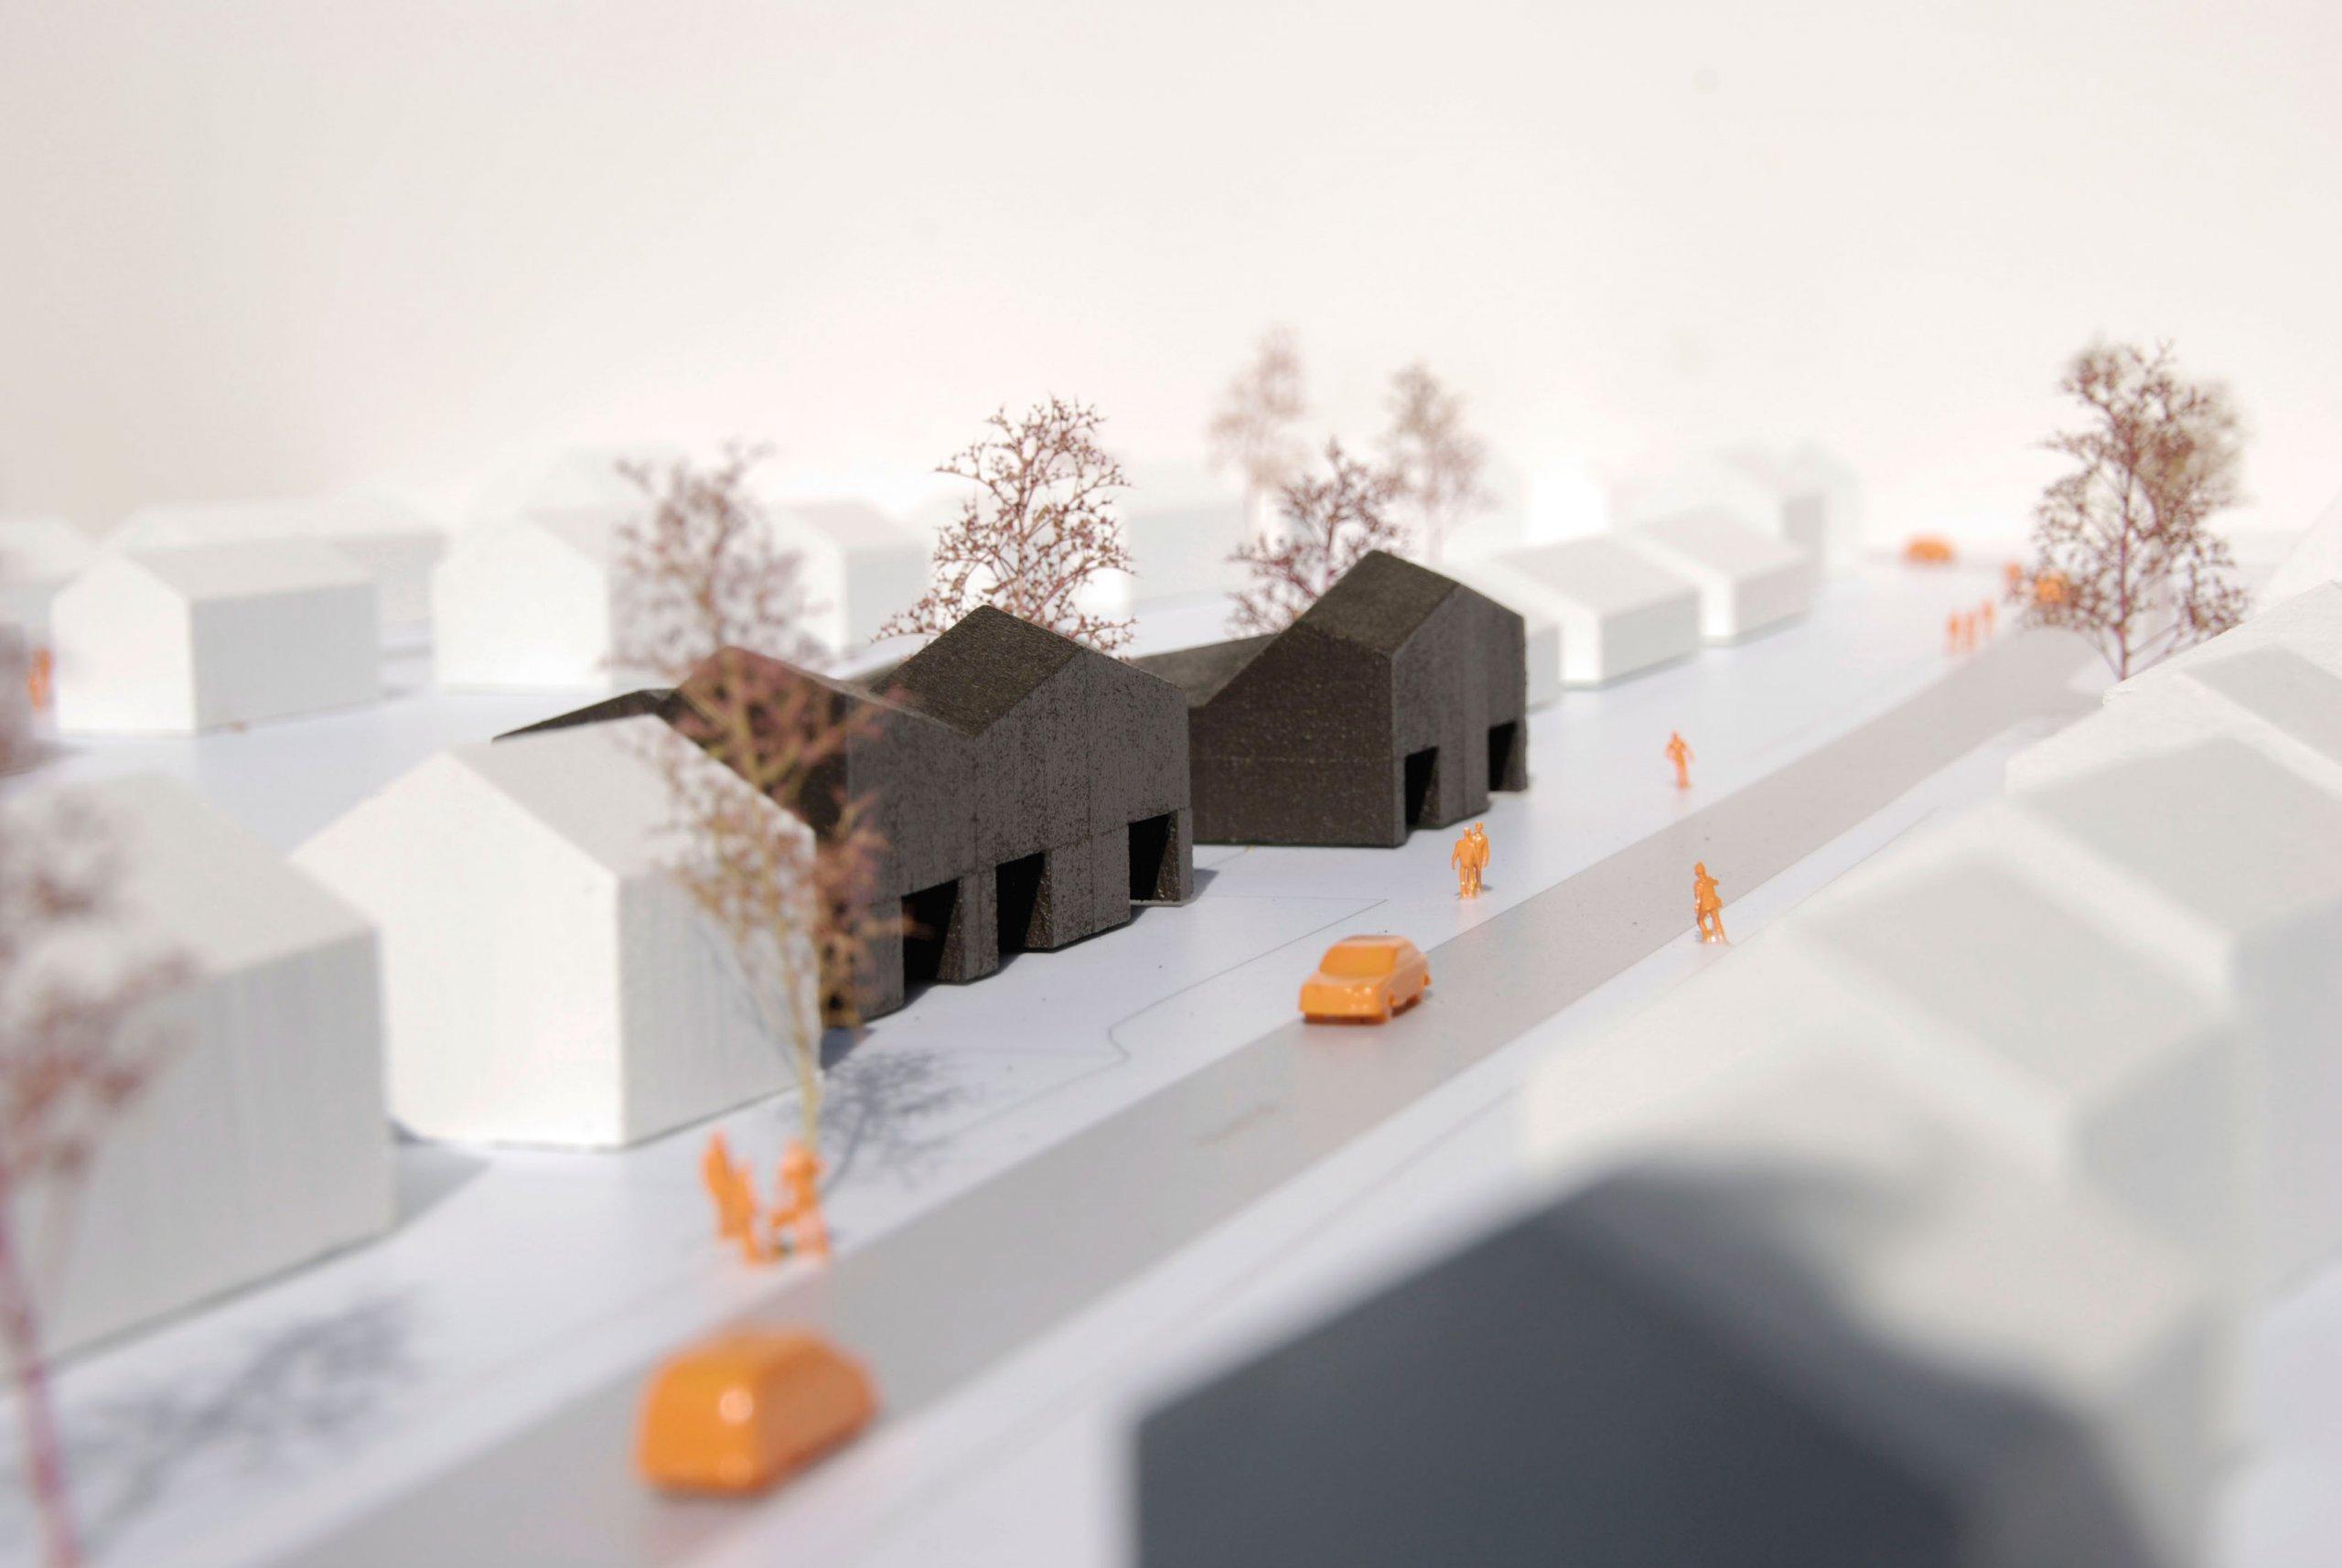 Situatie van bakstenen senioren woningen in Nederasselt, provincie Gelderland